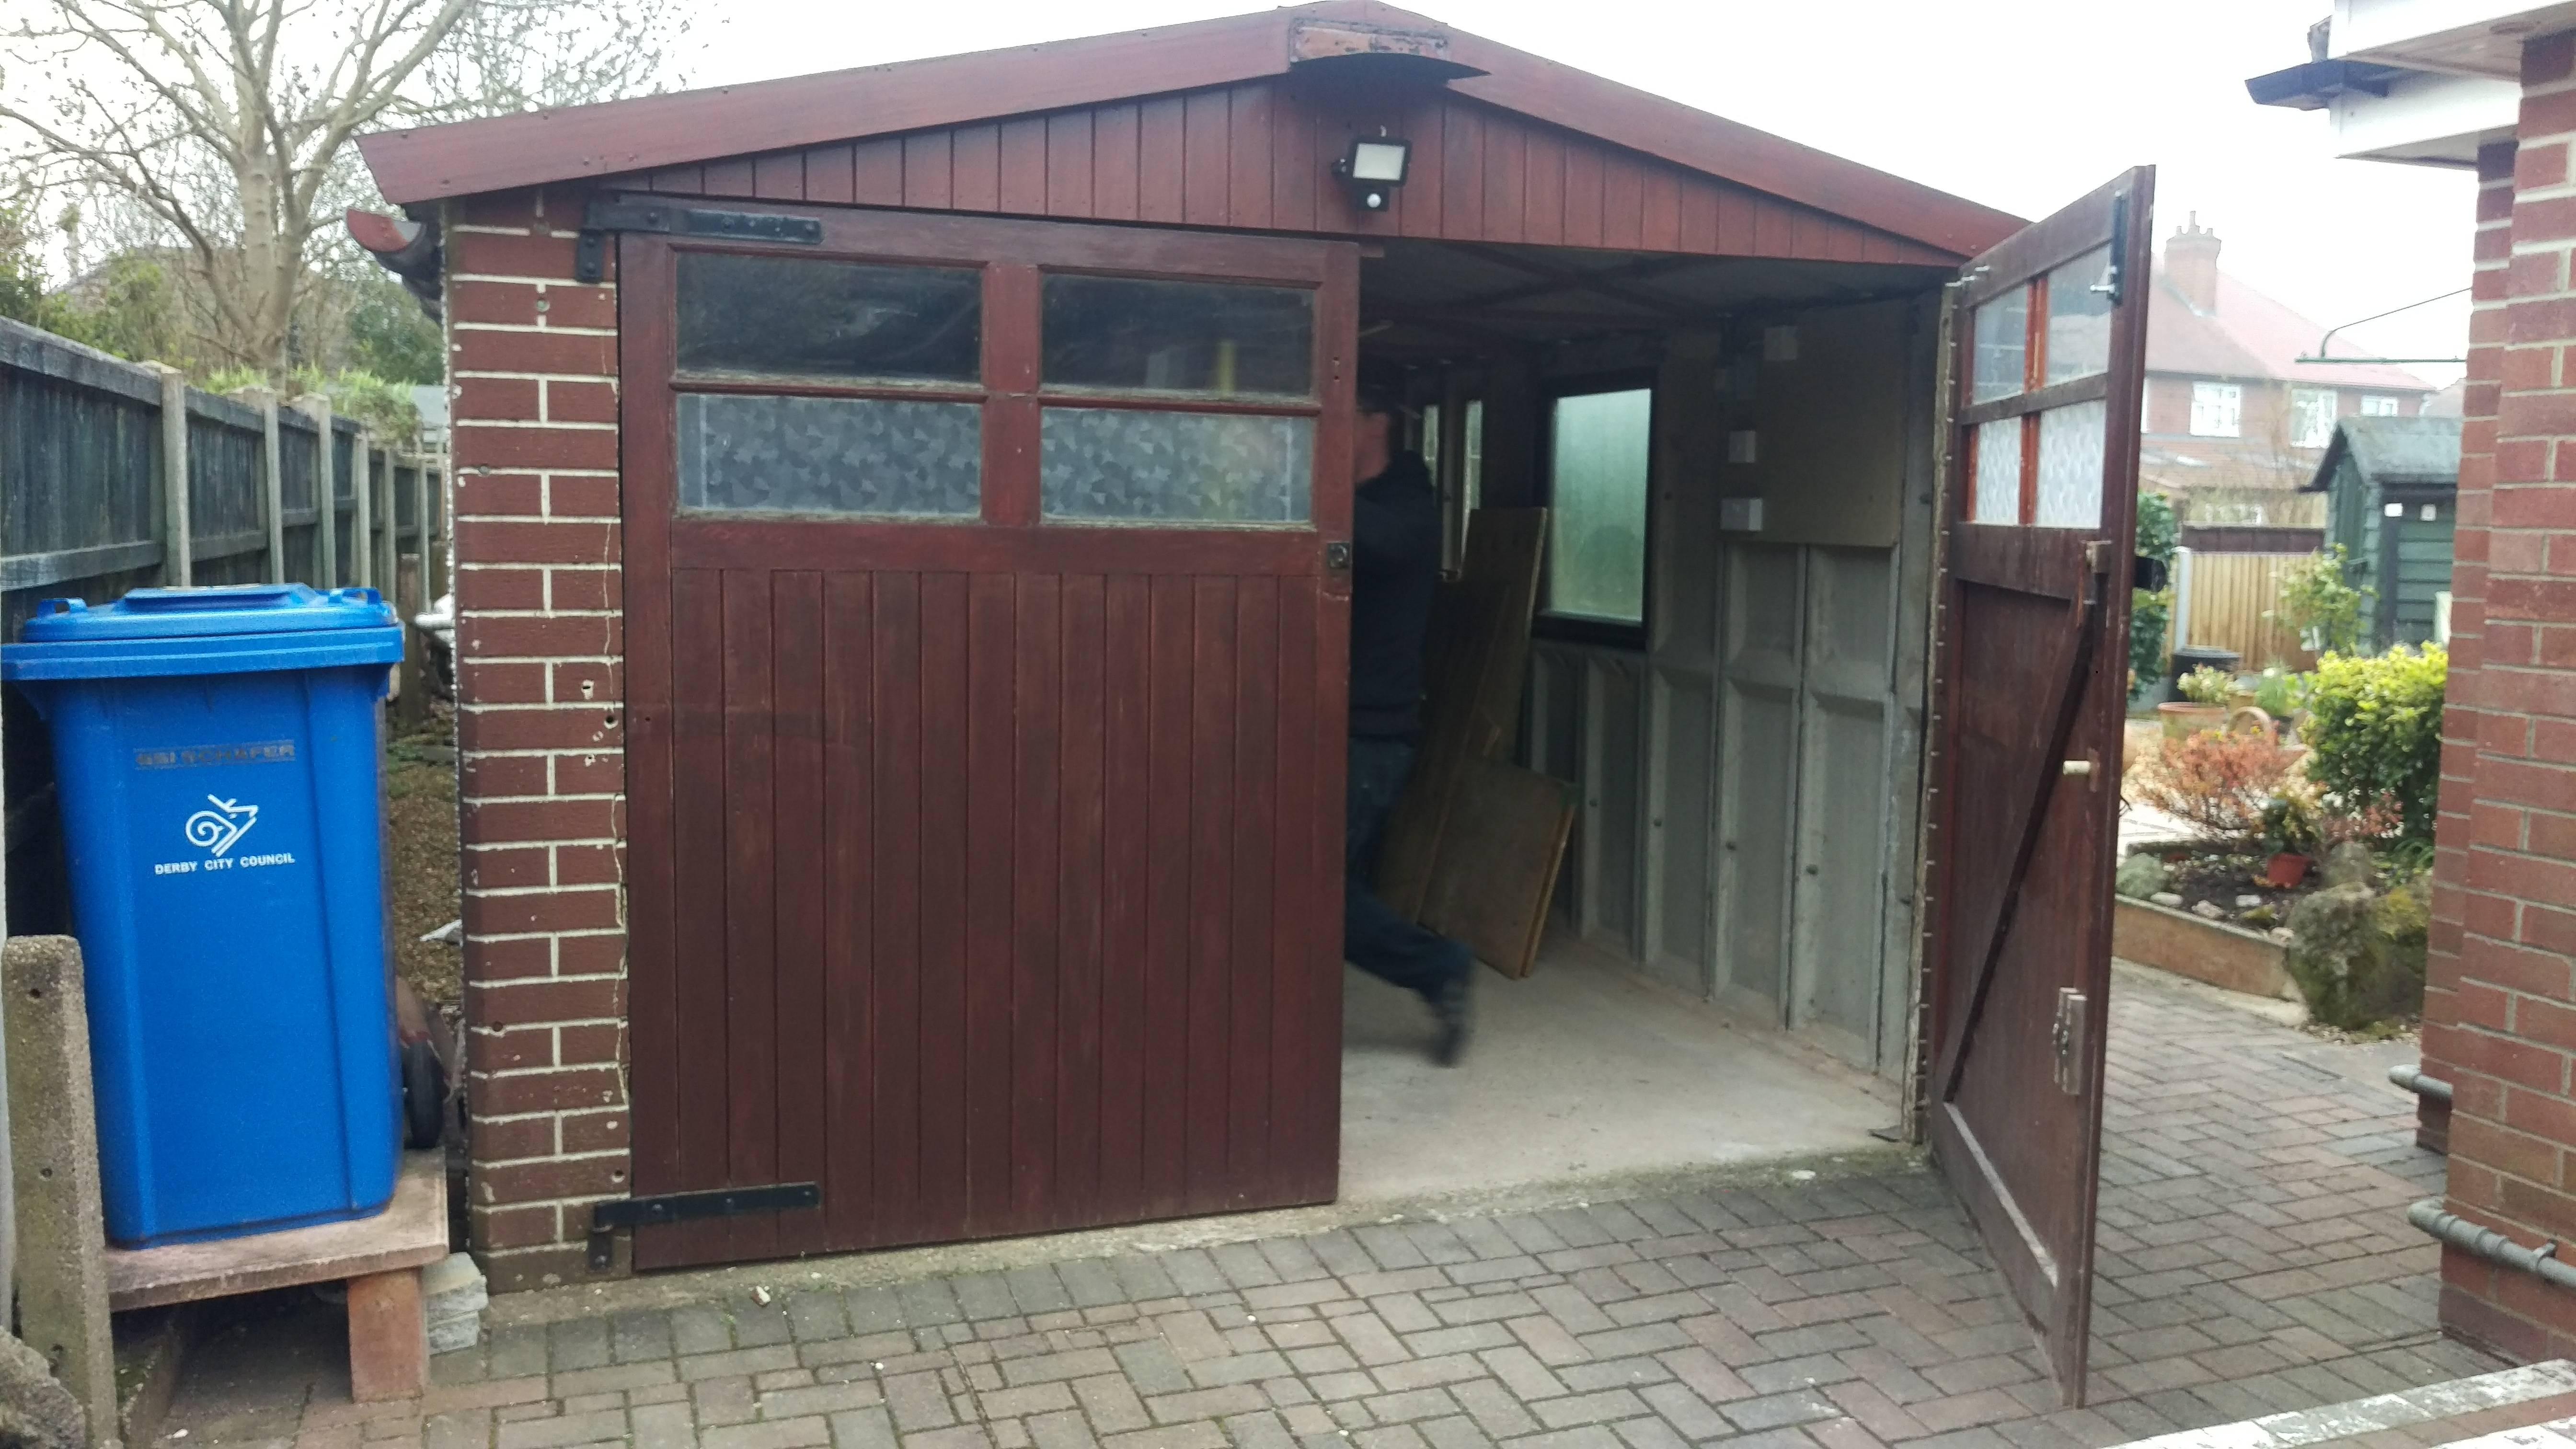 opener door reasons haws rolling overhead guelph automatic consider clopay doors to installation wm insulated garage